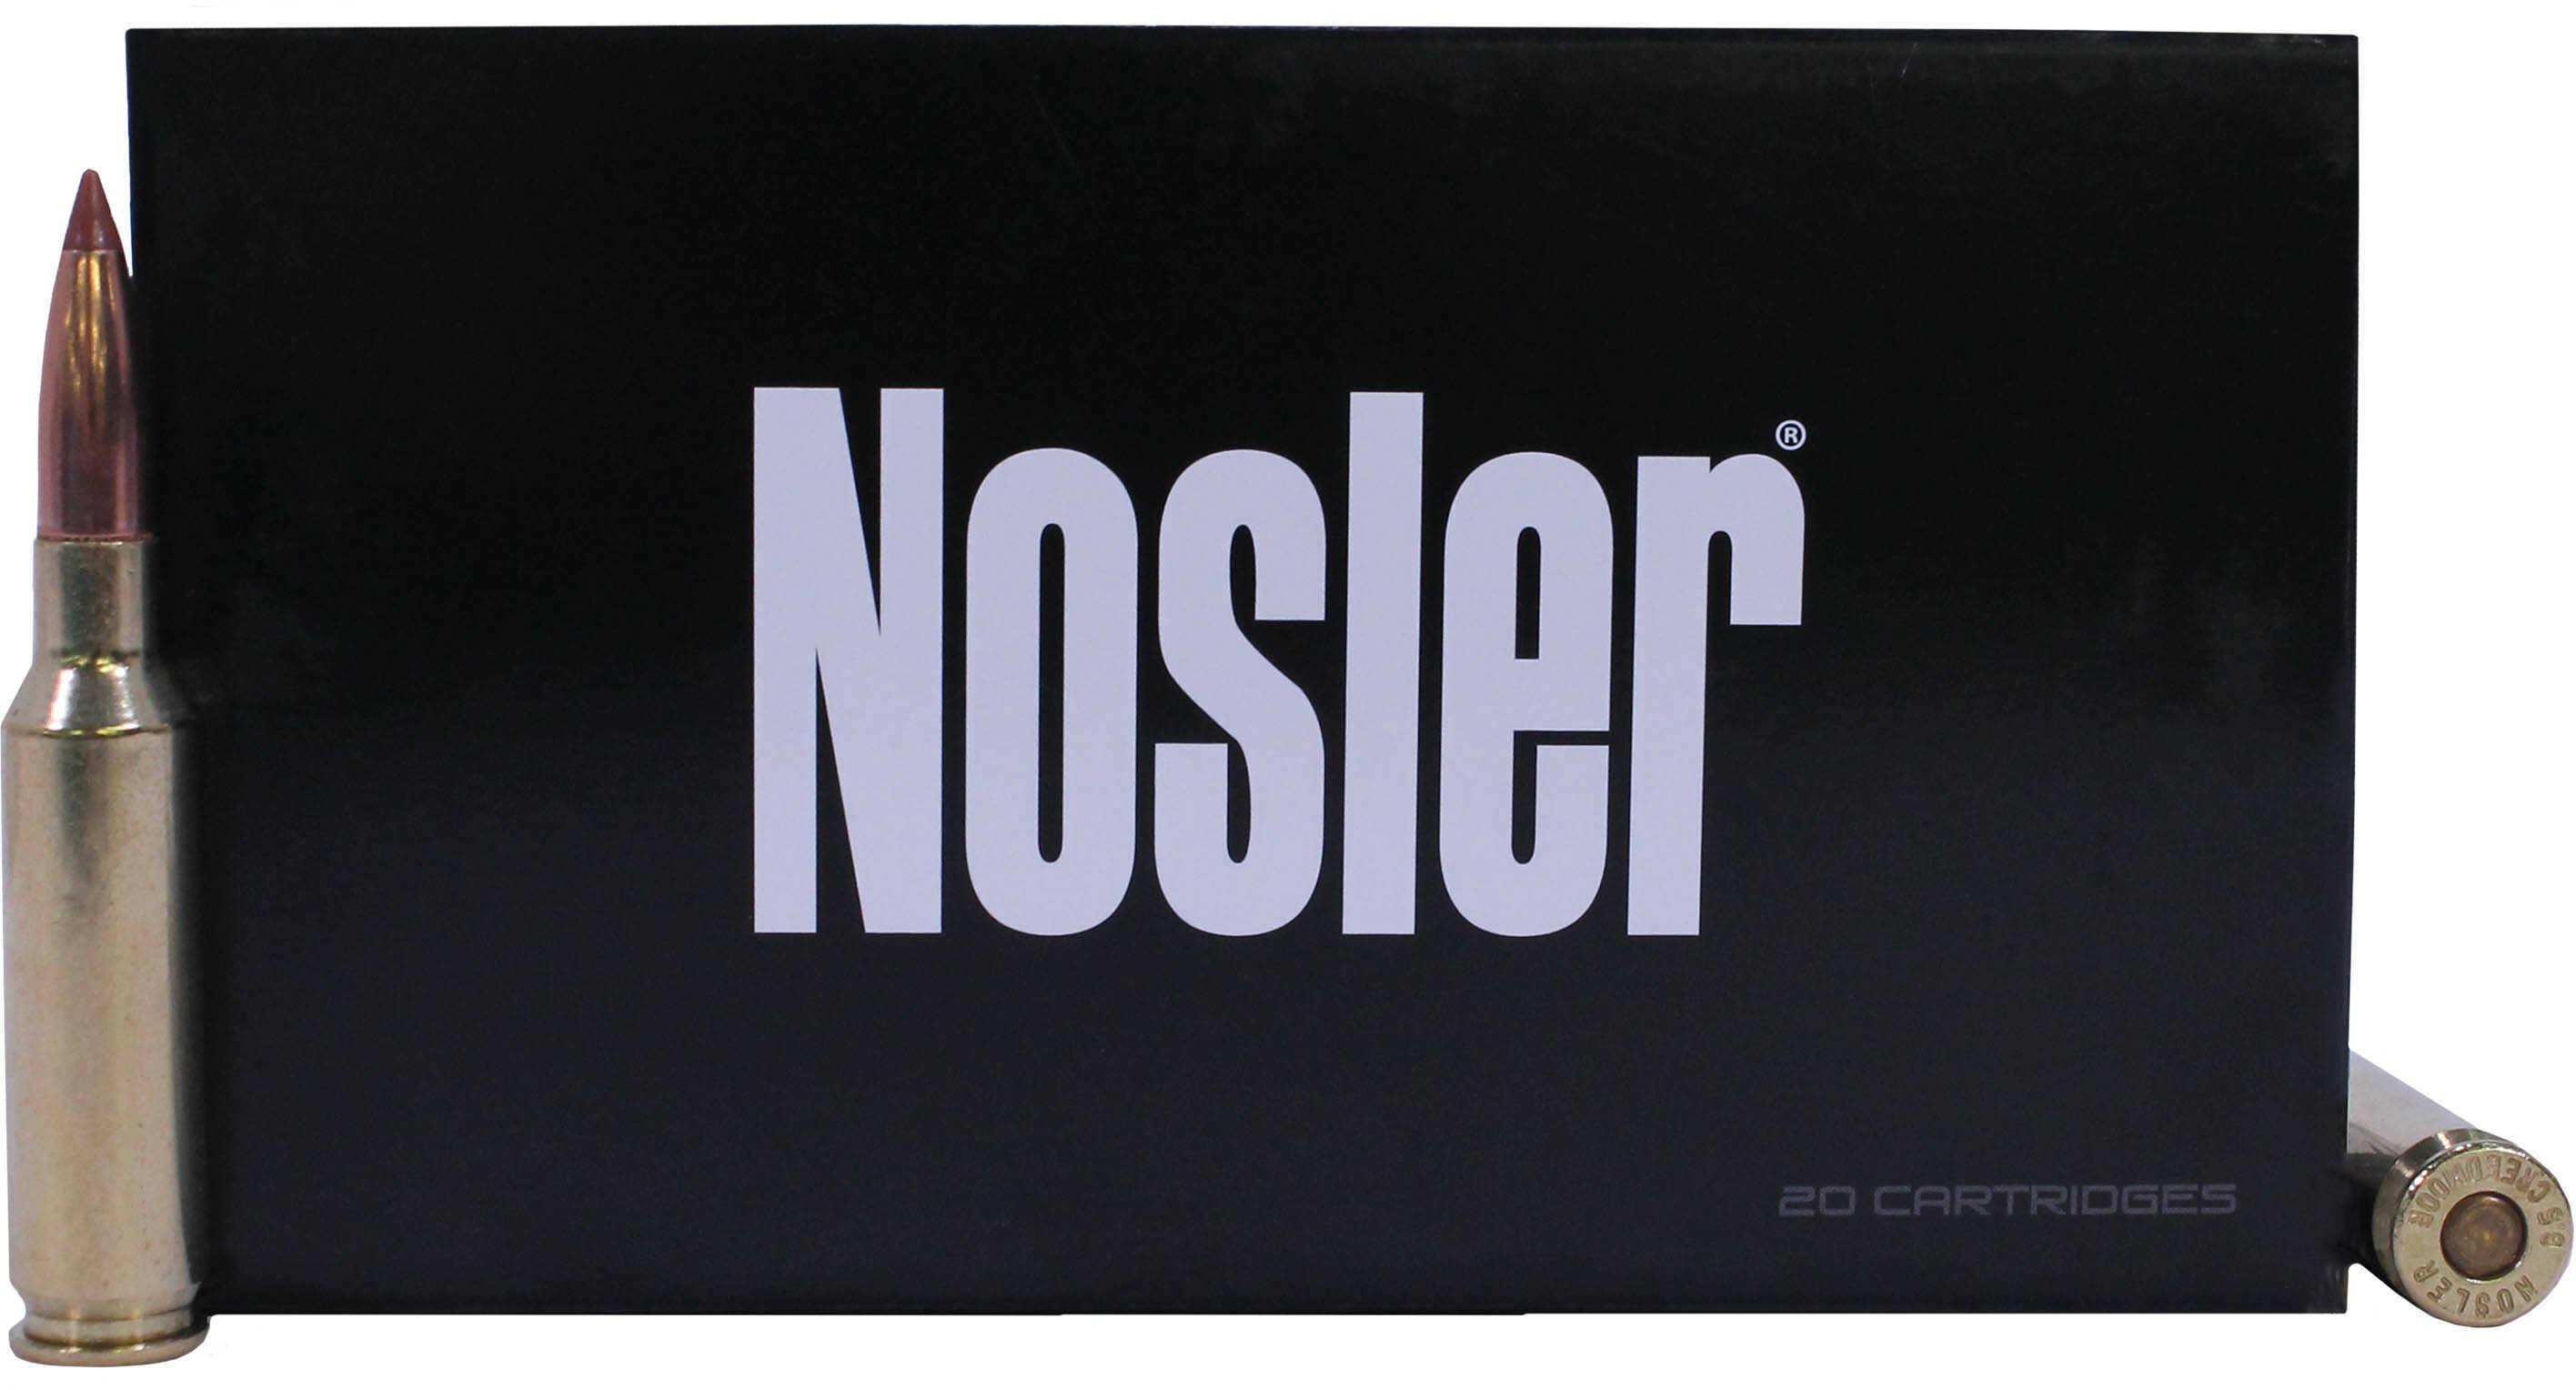 Nosler 6.5 Creedmoor Ballistic Tip 140 Grain Ammunition, 20 Rounds Per Box Md: 40064